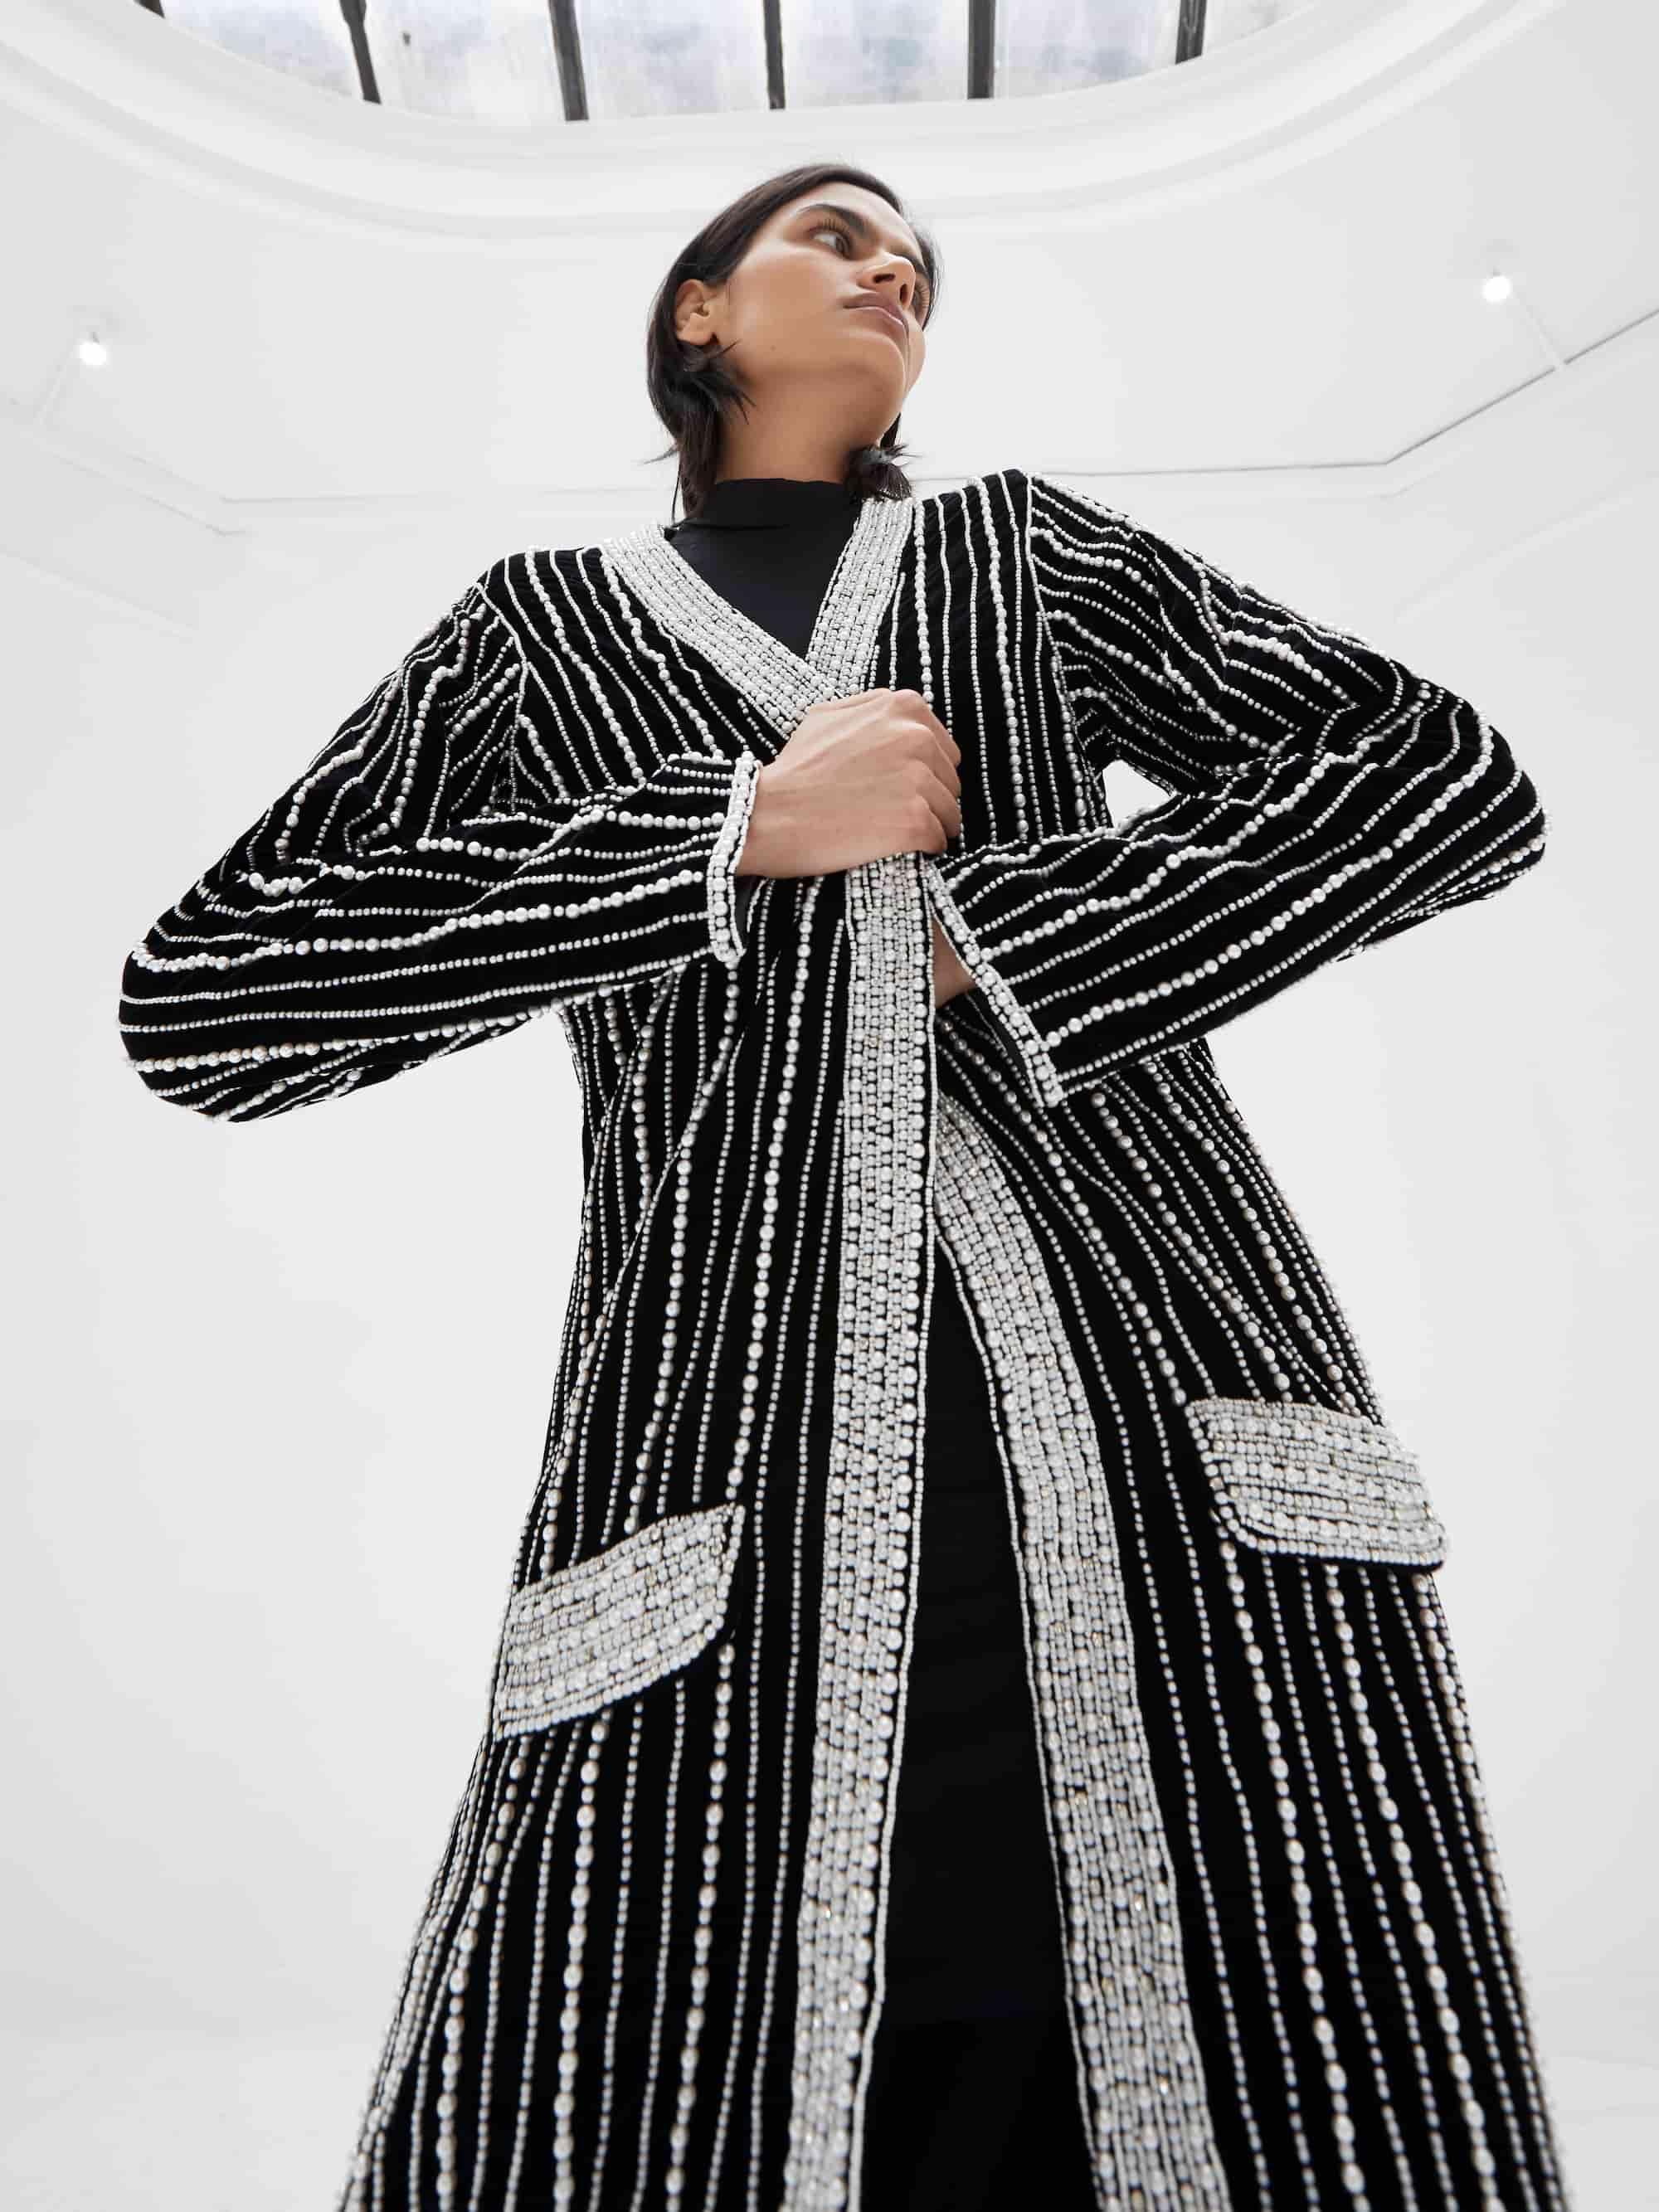 View 3 of model wearing Kasia Kimono in black.